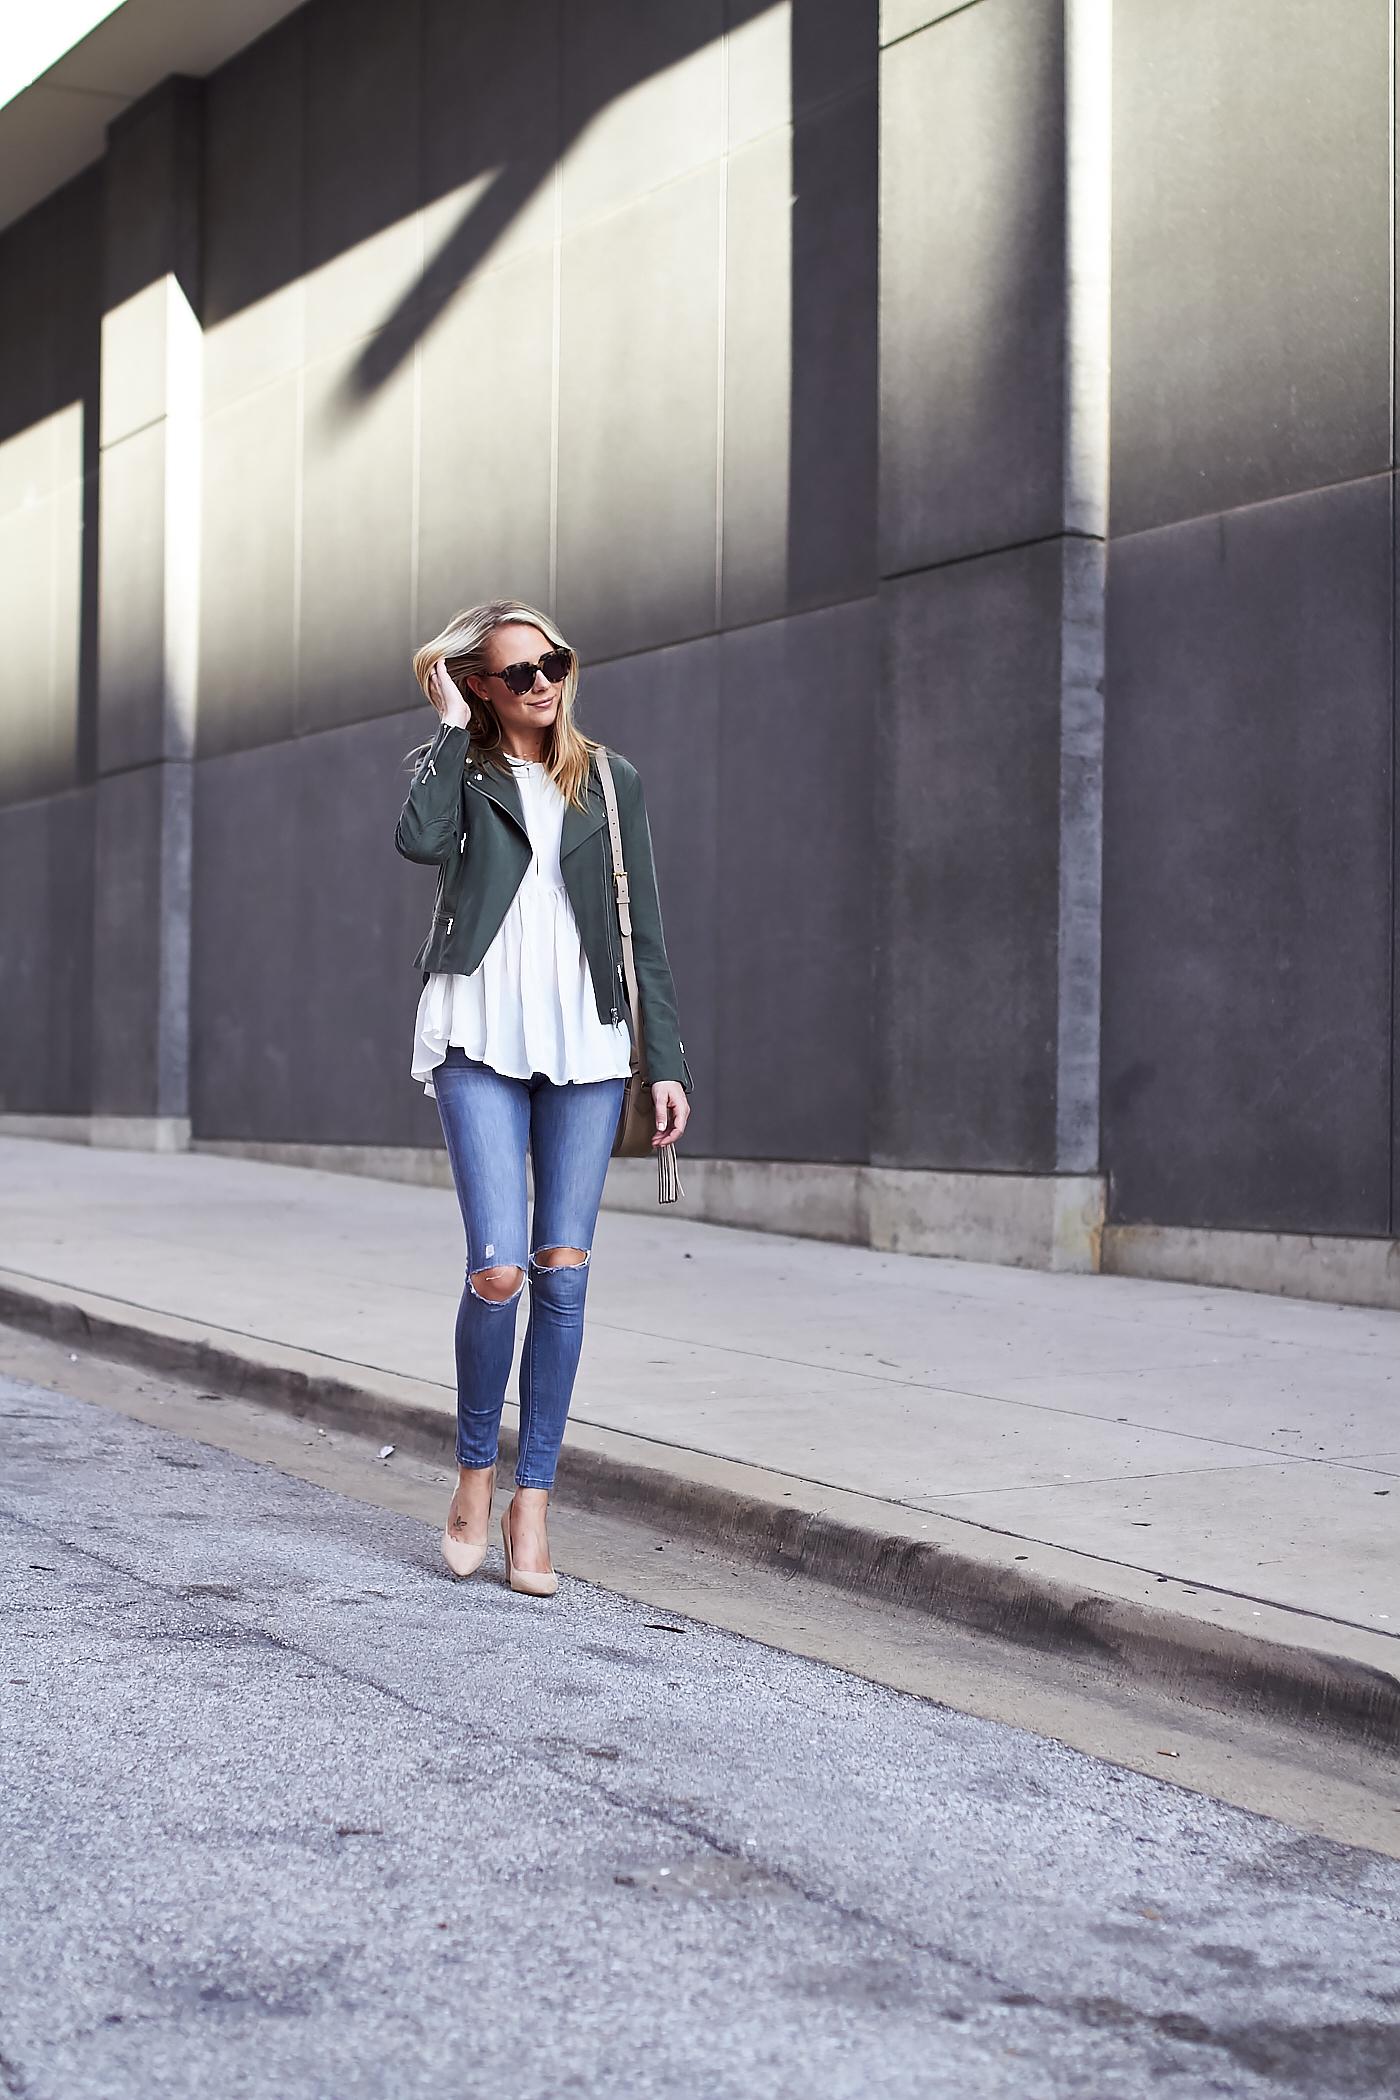 fashion-jackson-club-monaco-olive-green-moto-jacket-denim-ripped-skinny-jeans-white-blouse